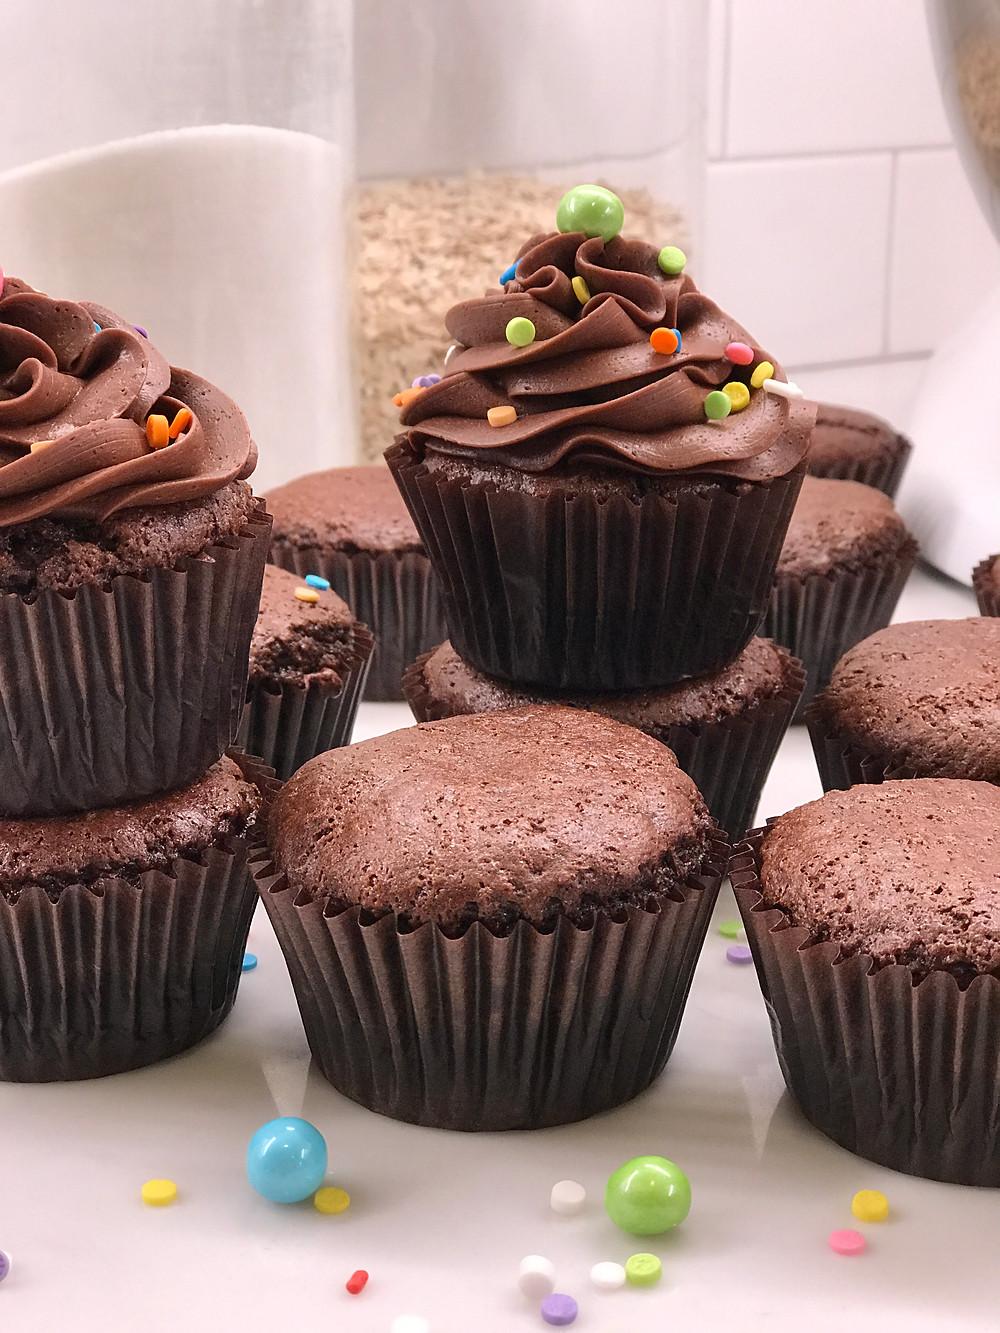 Back to basics with a chocolate cupcake